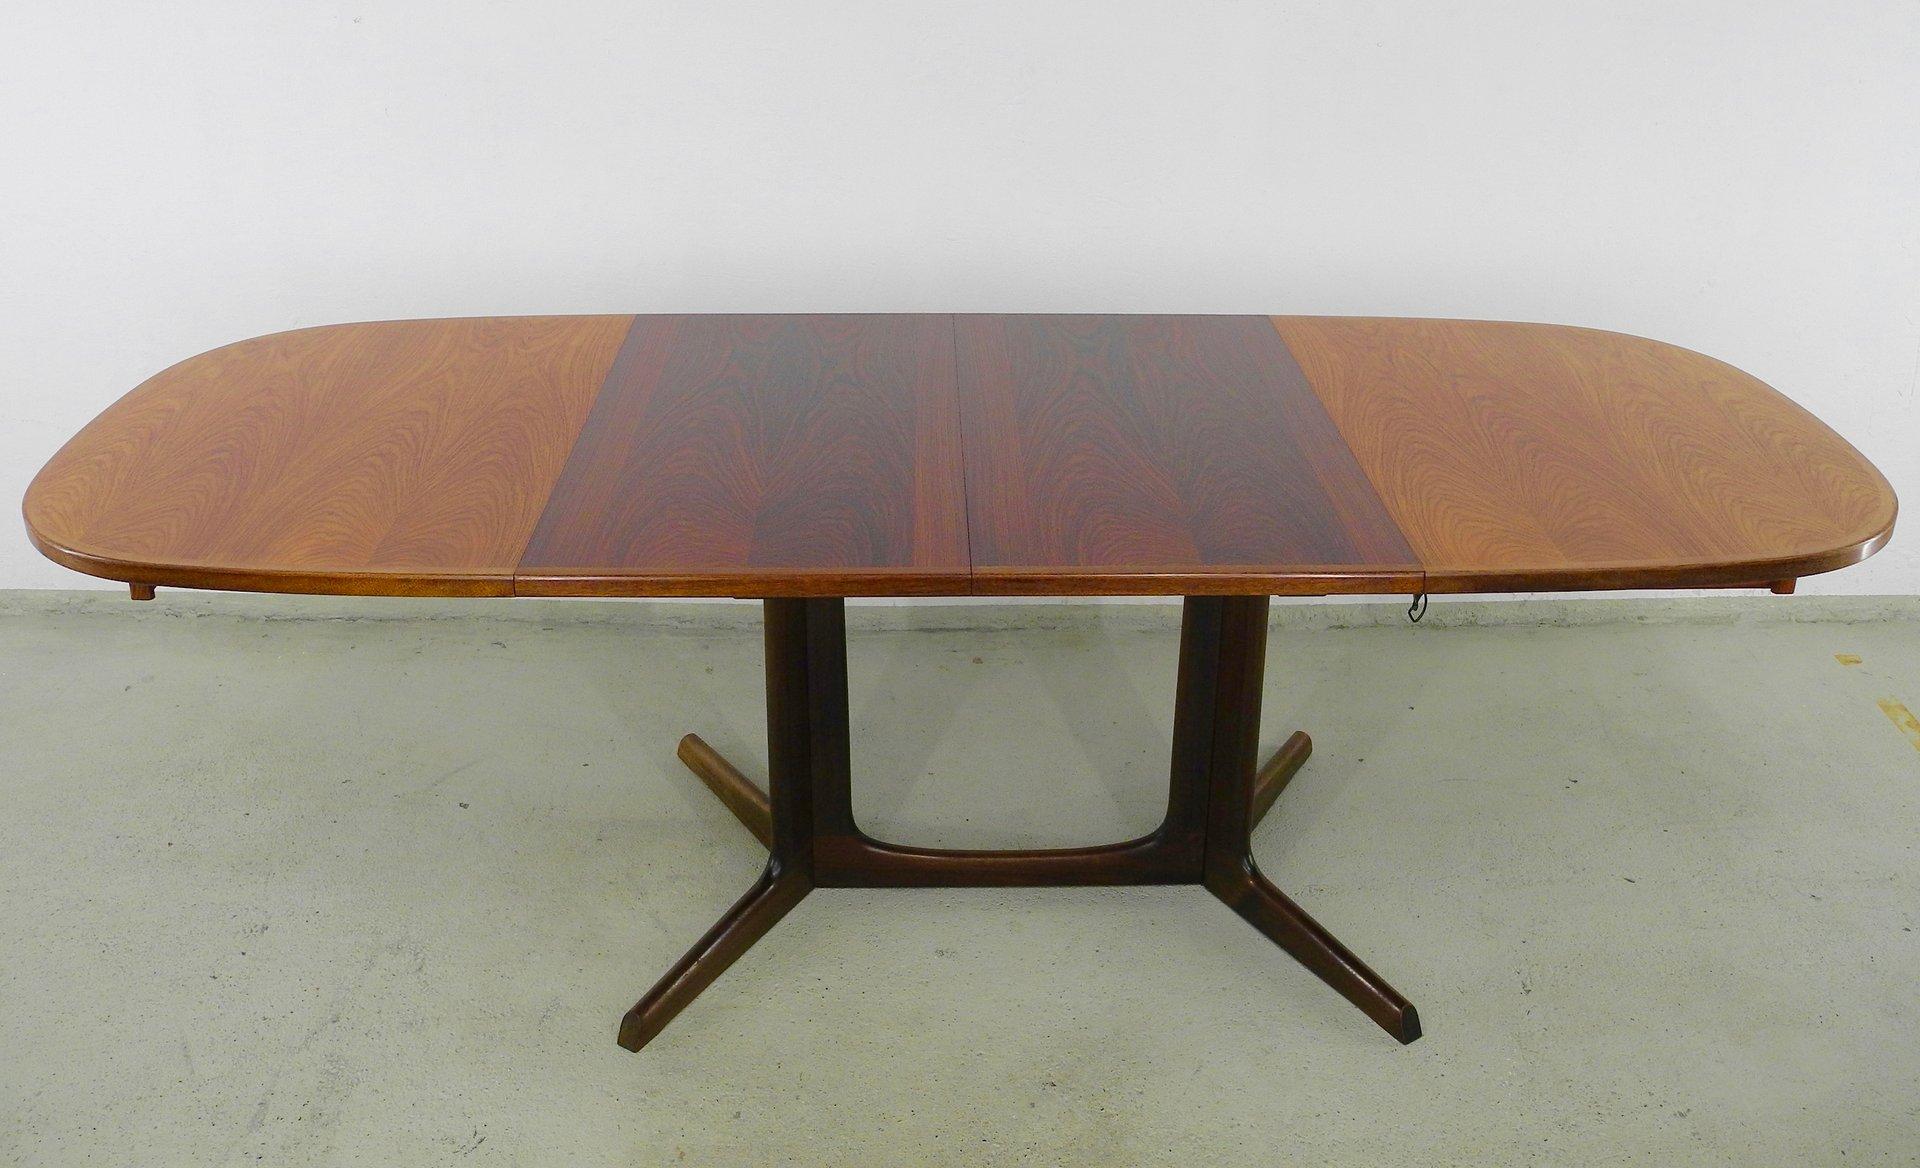 table de salle manger vintage par niels o m ller pour gudme m belfabrik en vente sur pamono. Black Bedroom Furniture Sets. Home Design Ideas